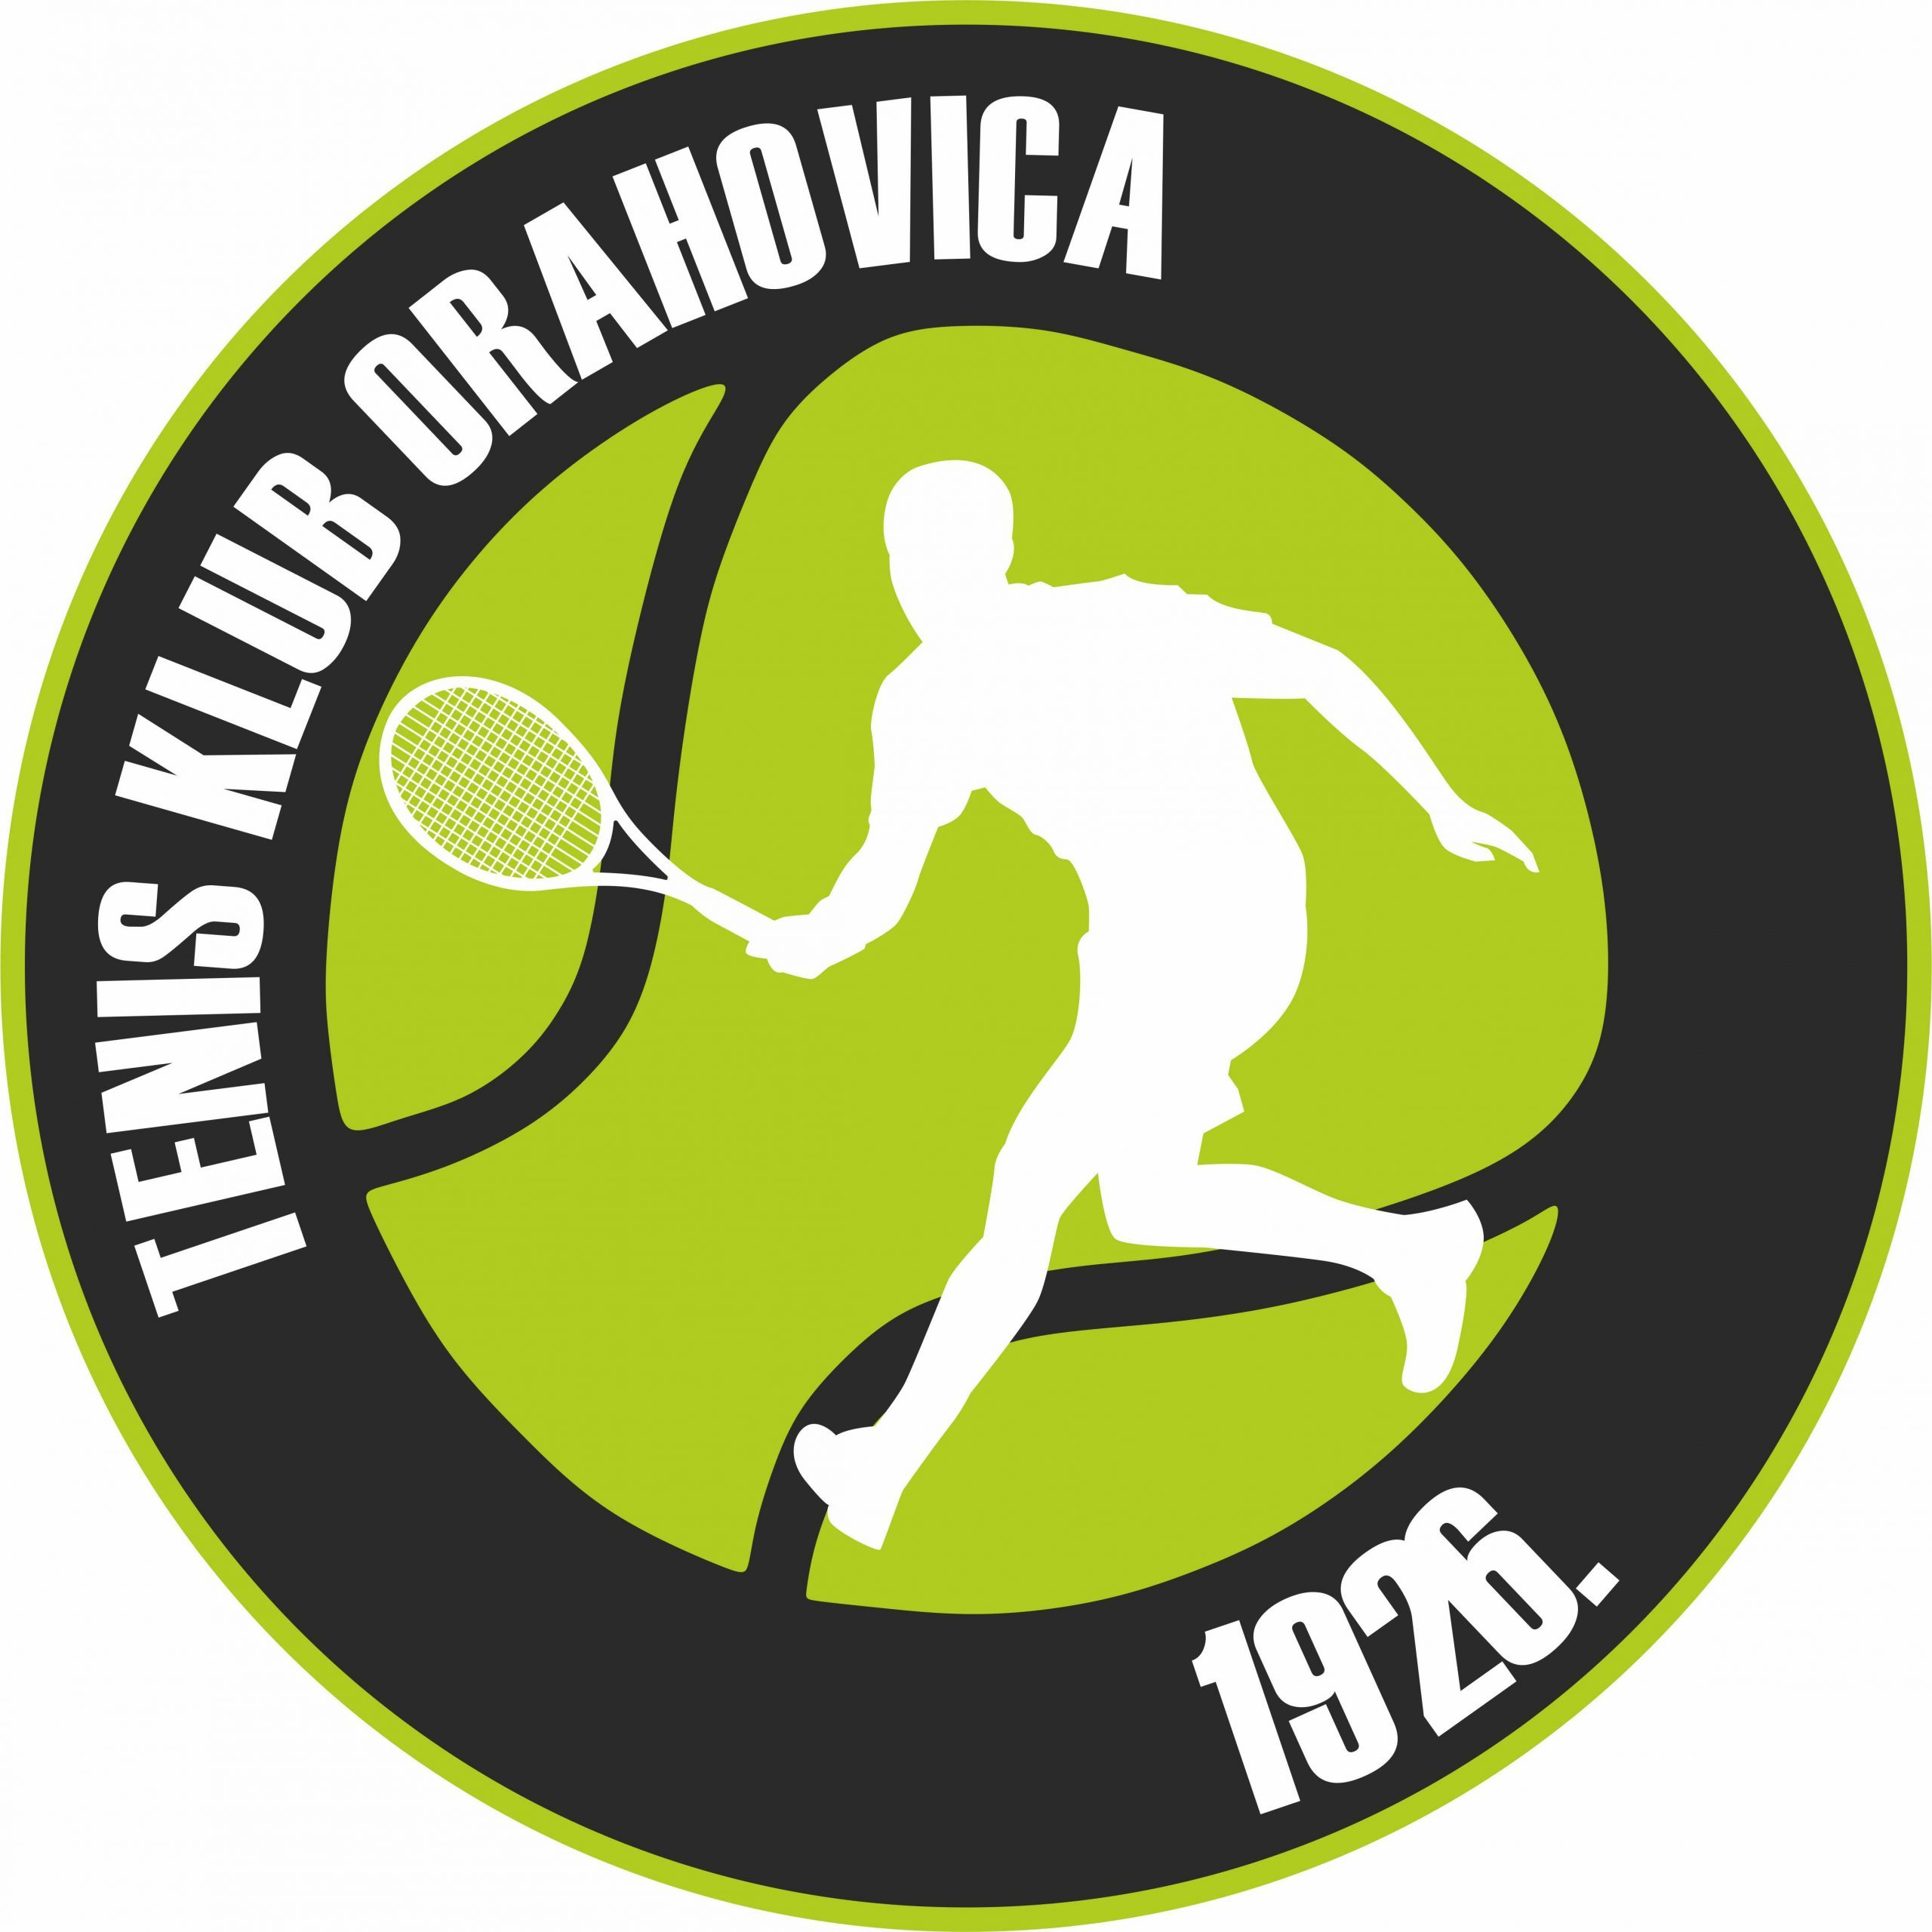 TK Orahovica